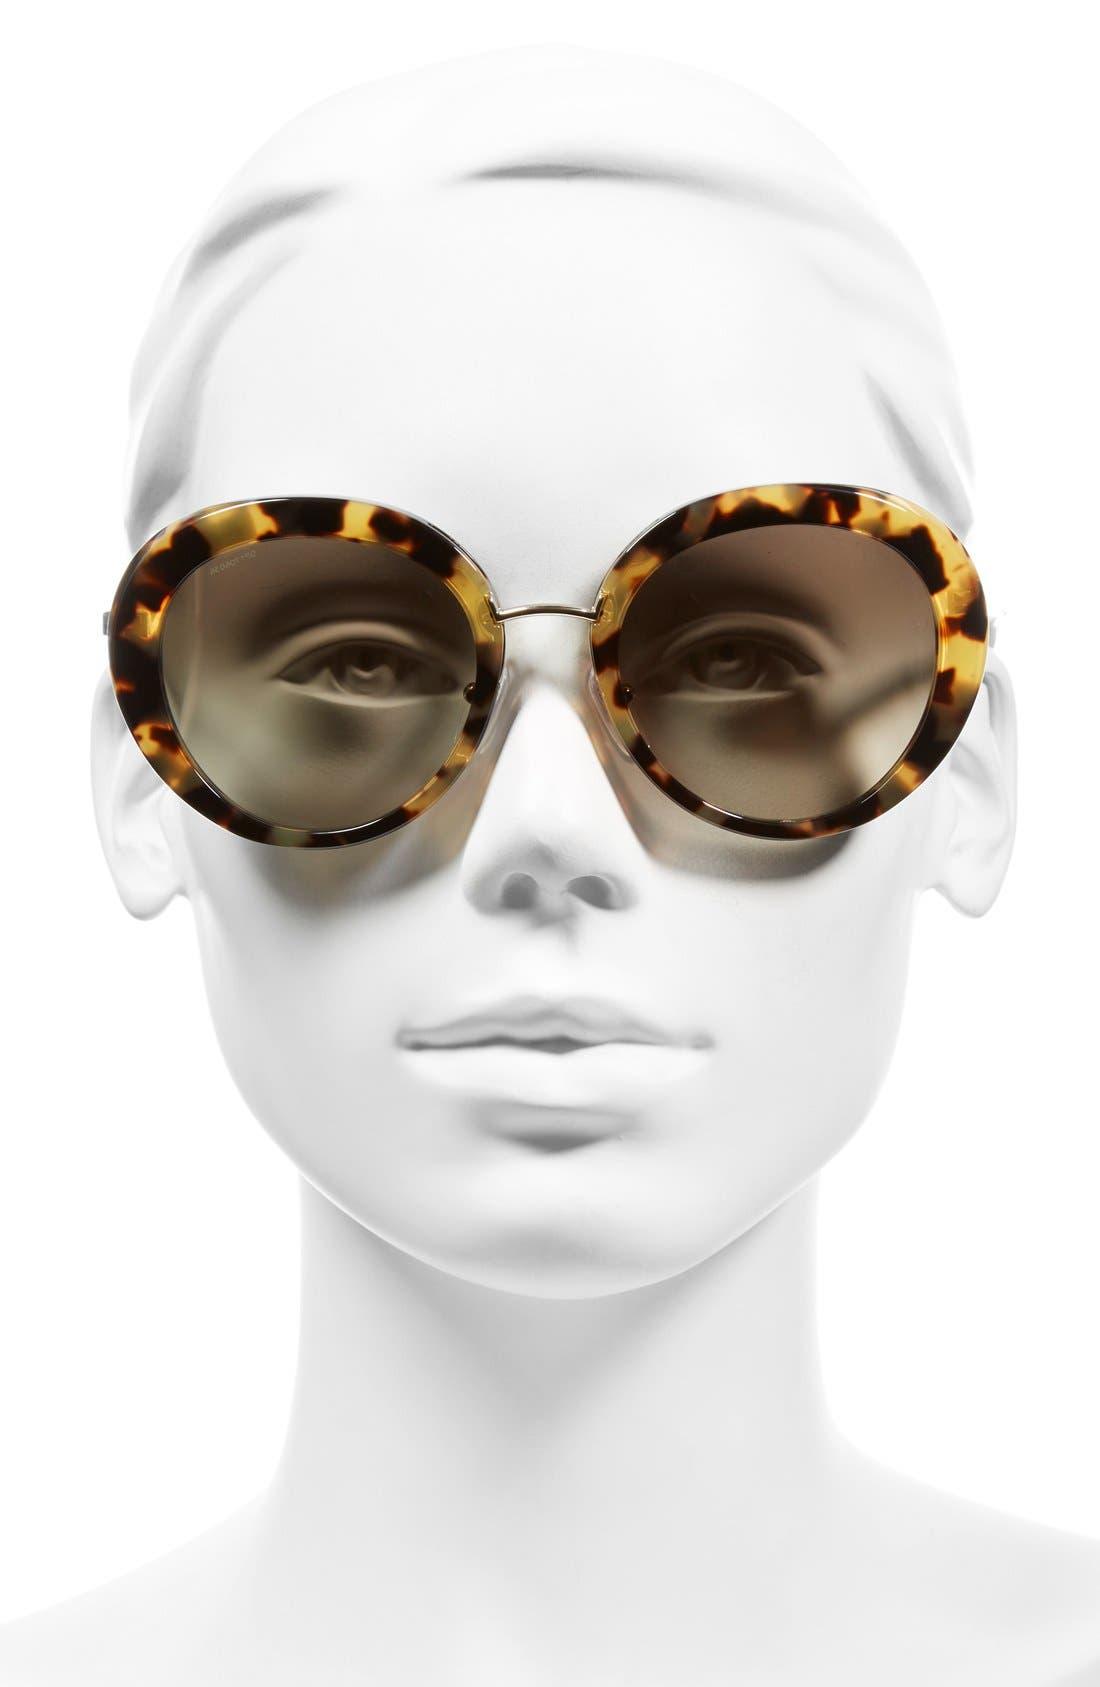 55mm Round Sunglasses,                             Alternate thumbnail 2, color,                             200